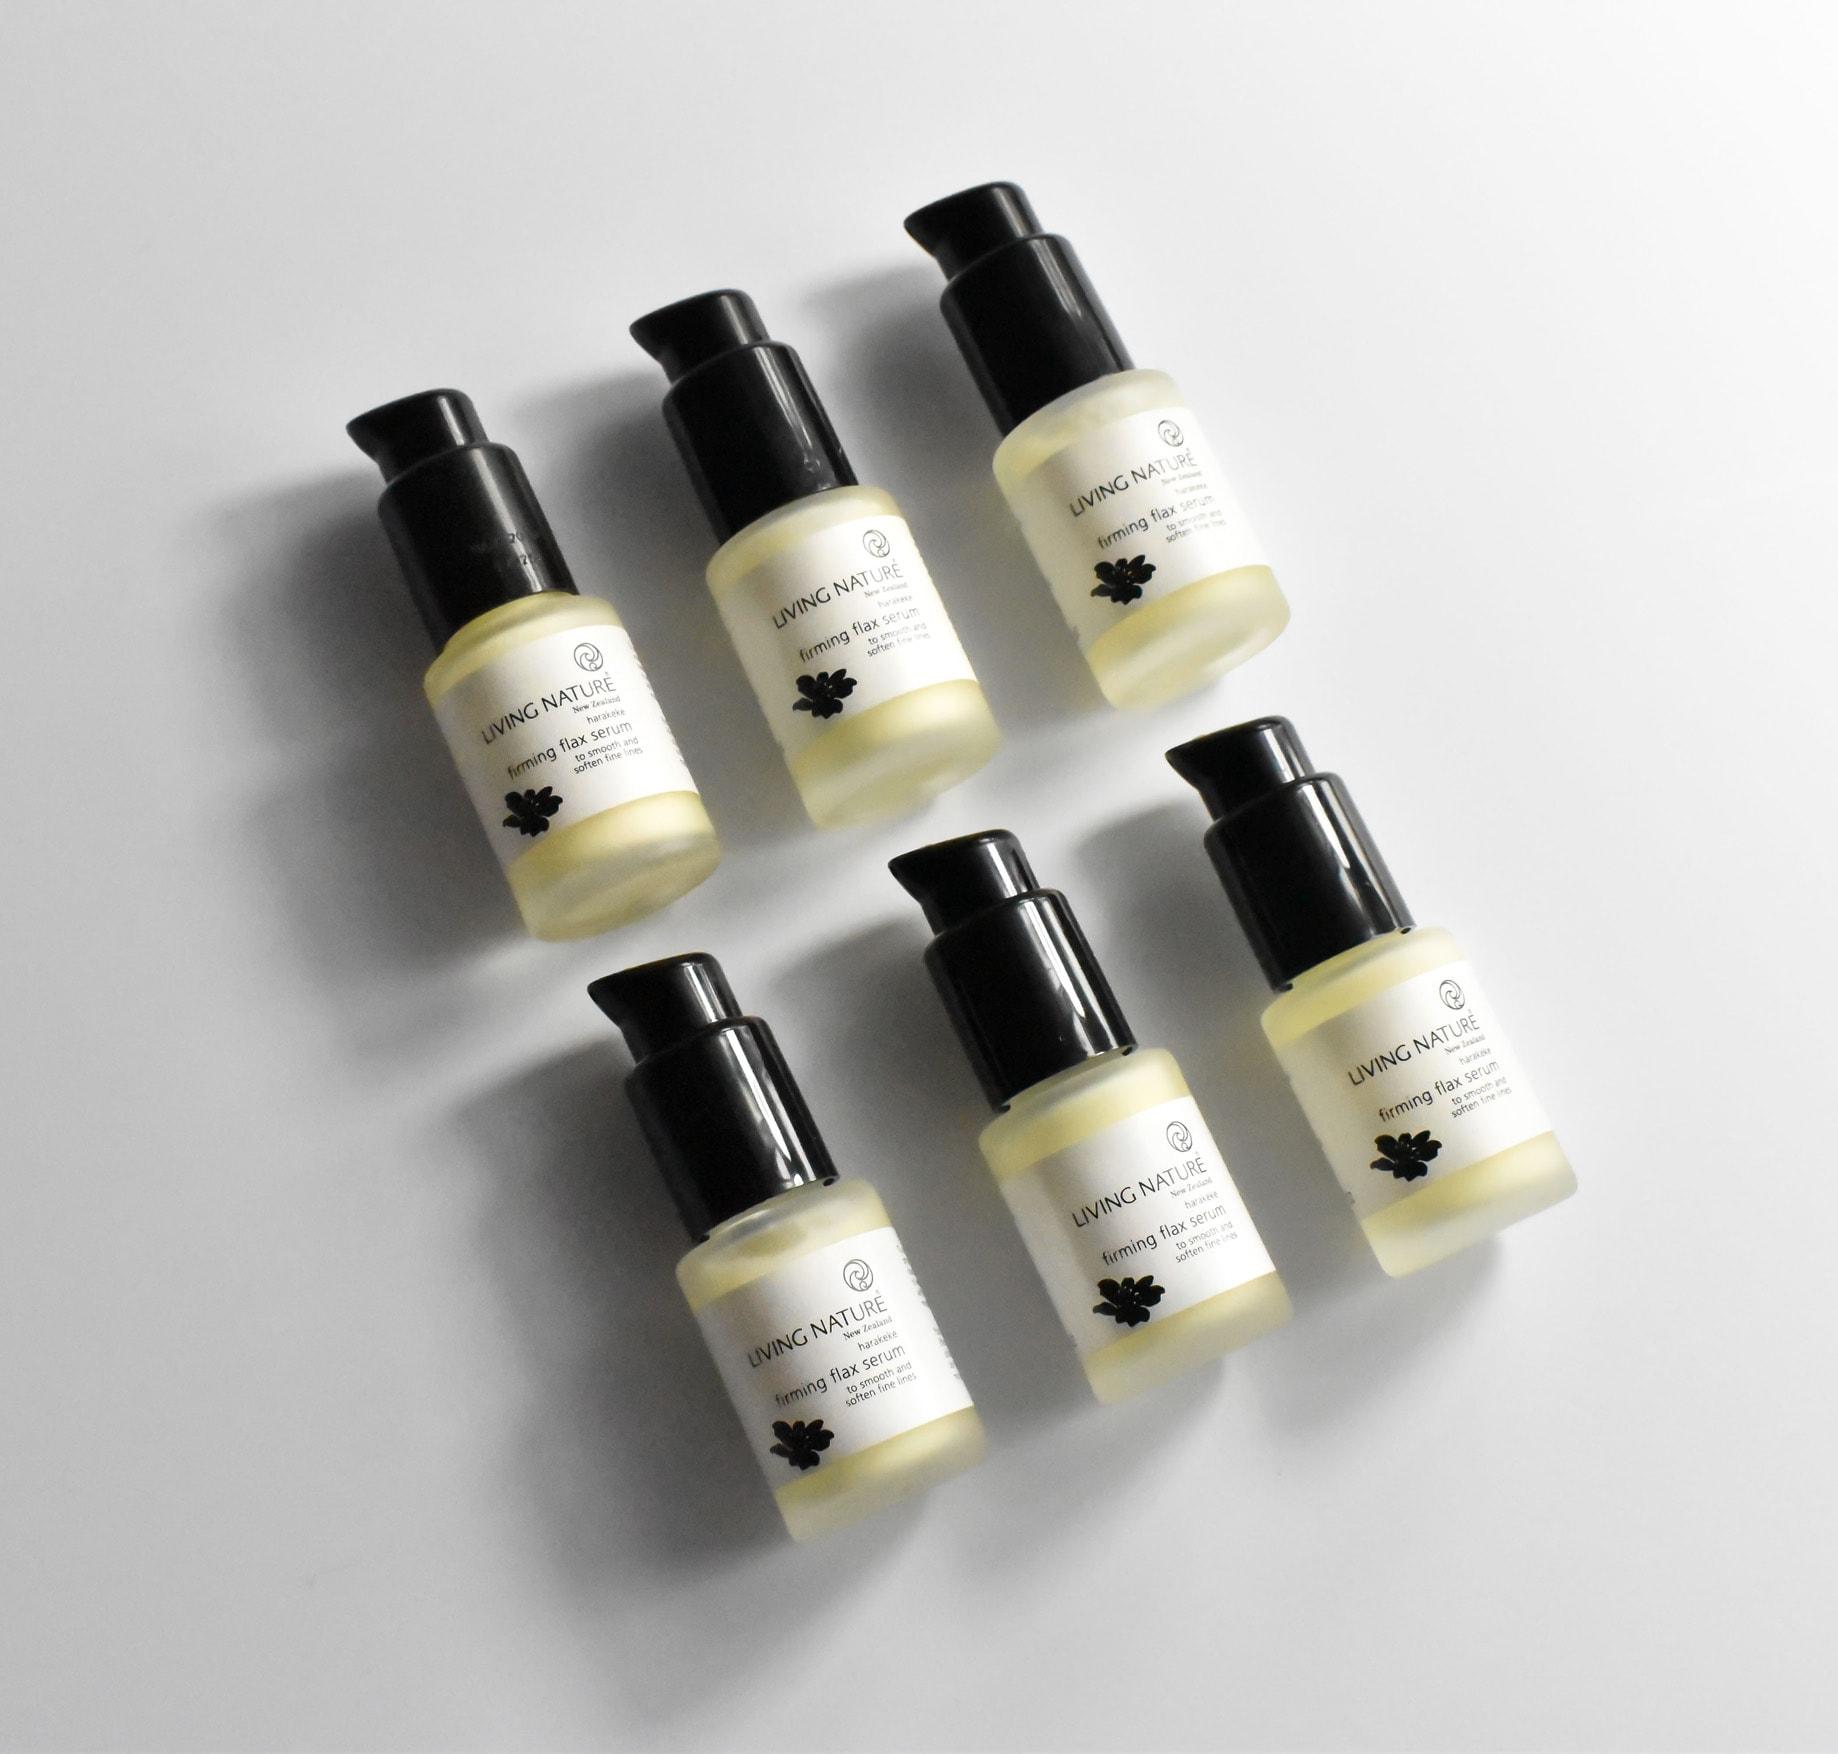 Living Nature Firming Flax Serum 2